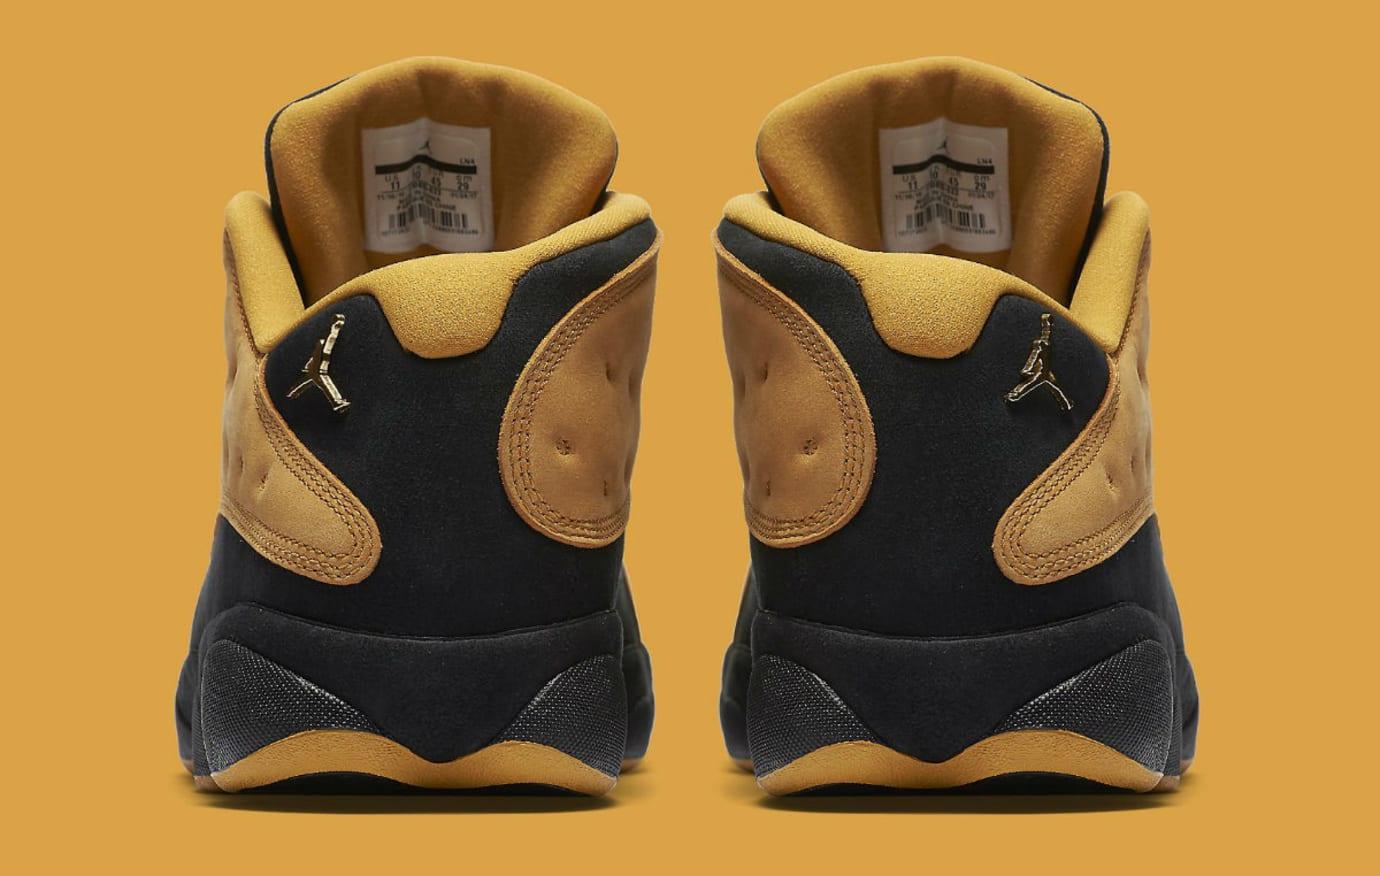 Air Jordan 13 Low Chutney Release Date Heel 310810-022